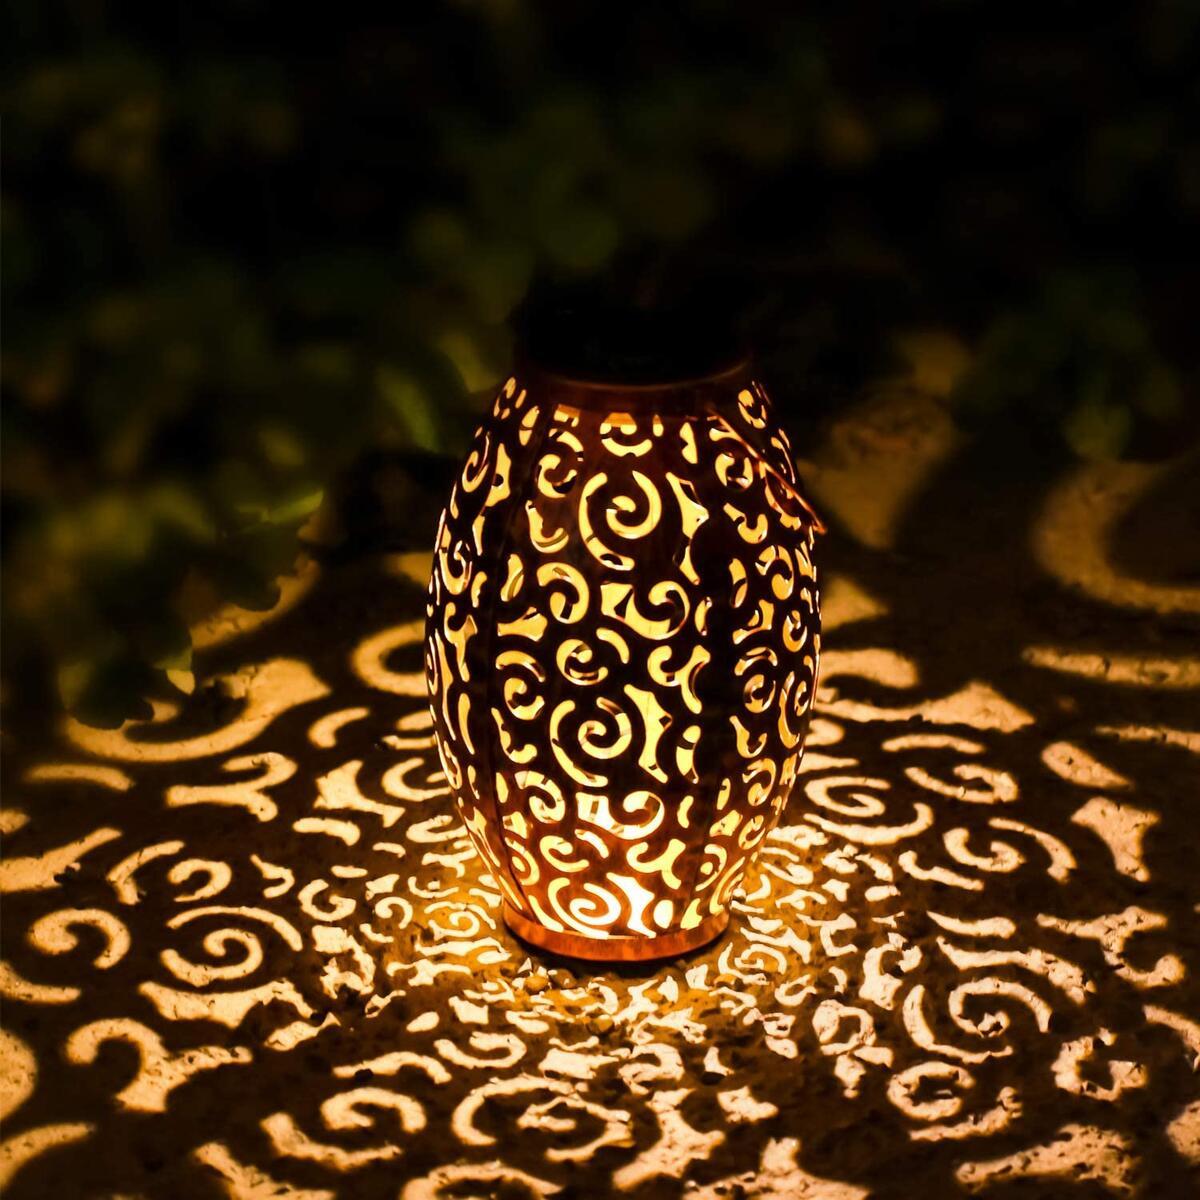 Solar Hanging Lantern Lights Waterproof,Retro Outdoor Solar Lanterns Lamp, Metal LED Solar Outside Lanterns Lamps Outdoor Decorations for Patio,Deck,Poch,Garden,Yard,Backyard